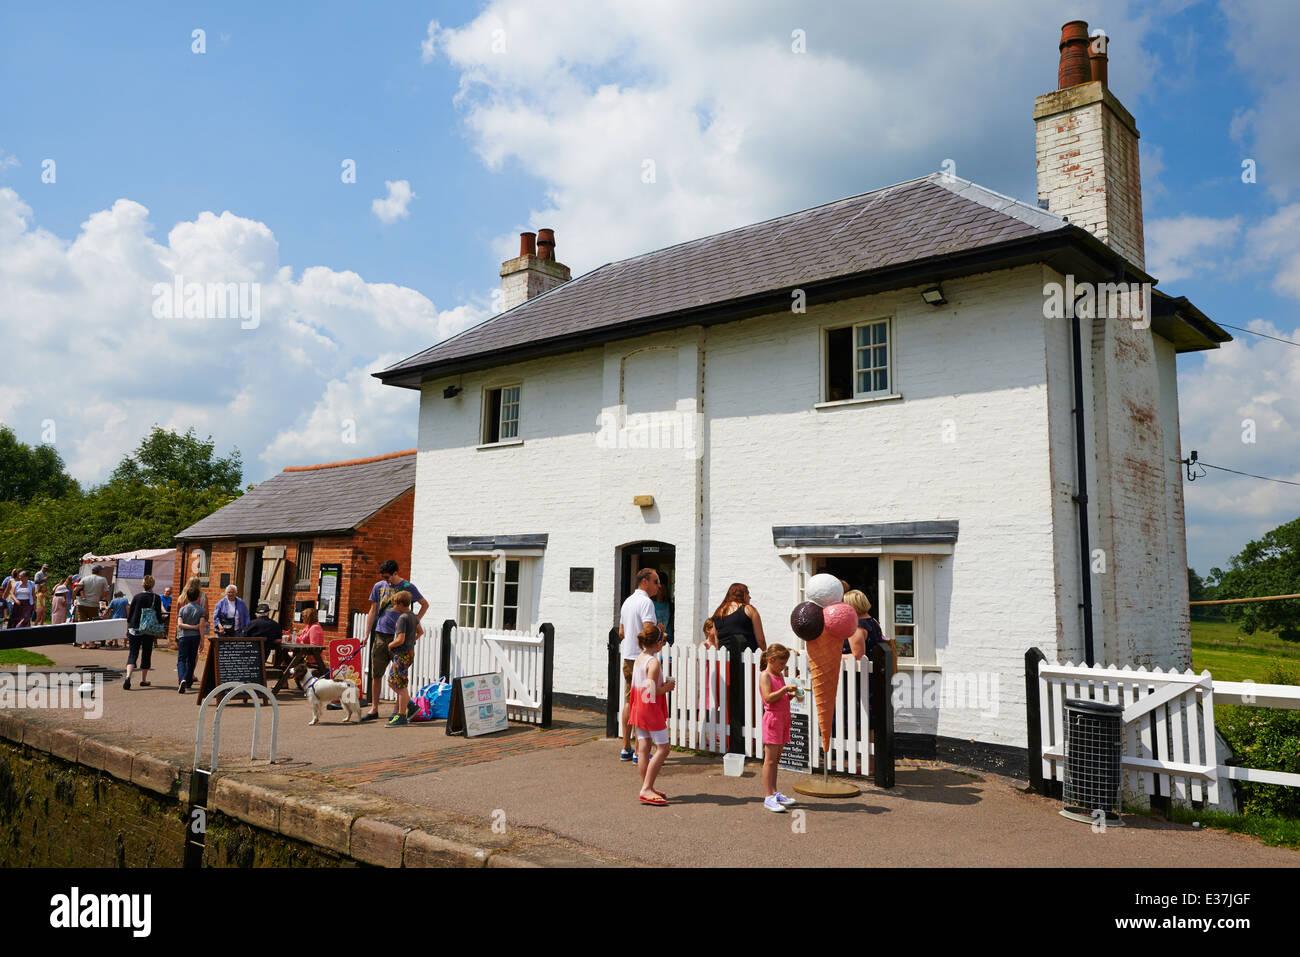 Top lock cottage & stables Foxton Locks Market Harborough Leicestershire UK - Stock Image